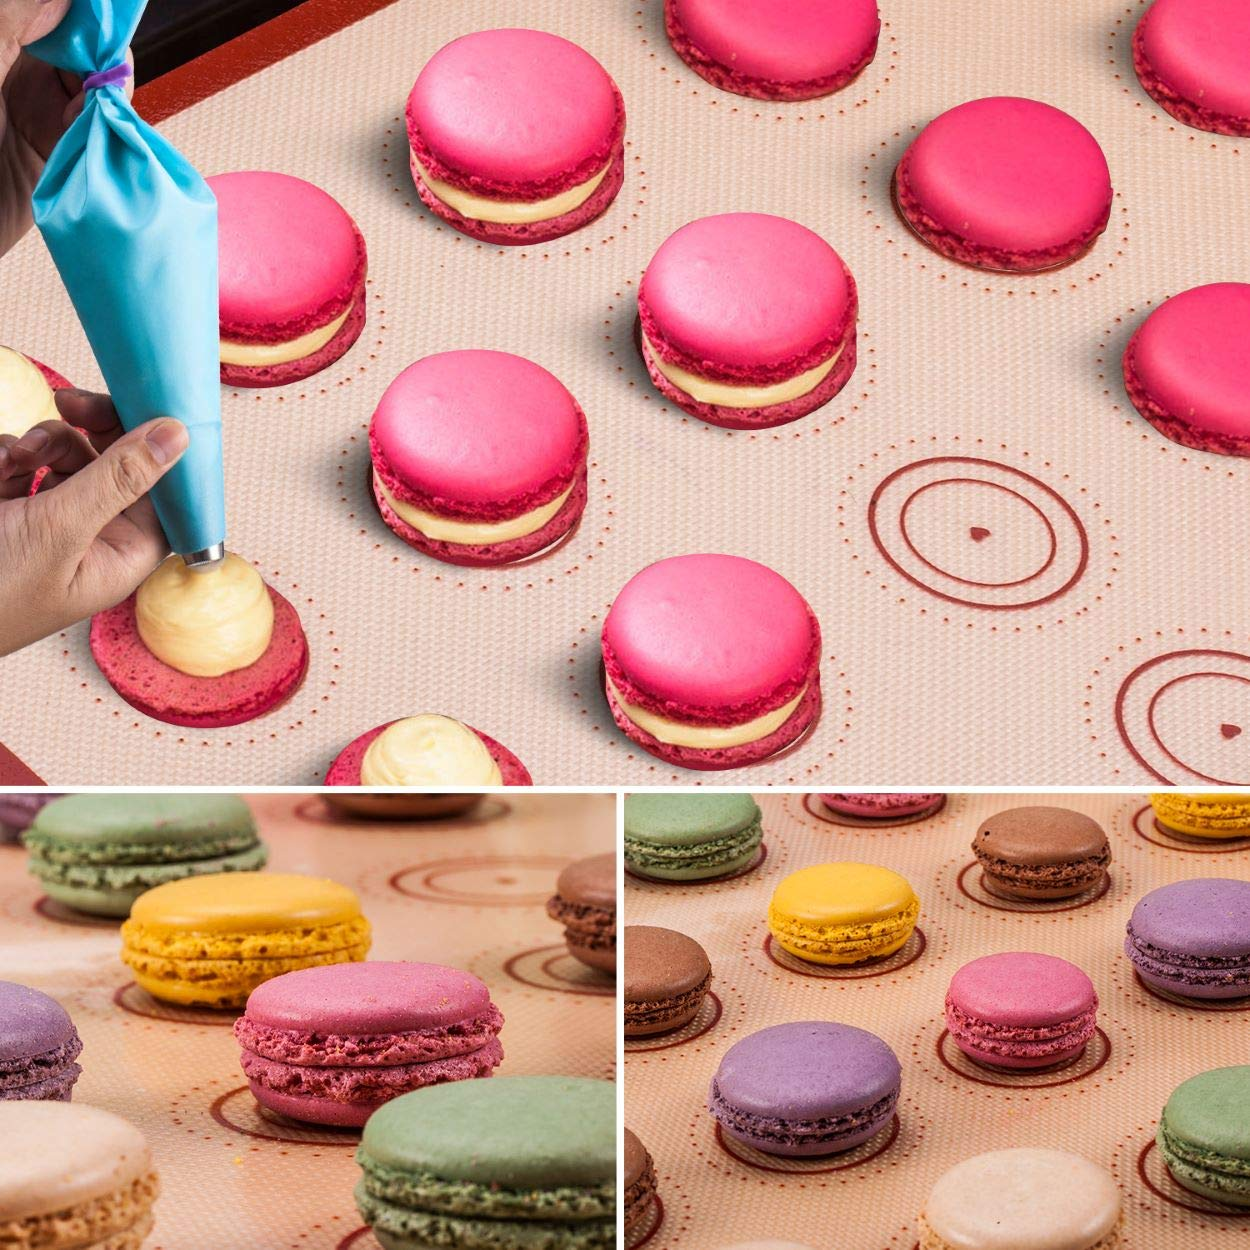 Silicone Baking Mat Macaron Mat Kit(14pcs set) Macaroon Baking Mat Set of 2 Half Sheet Macaron Silicone Mat Nonstick Macaron Mat Sheet,6 Piping Tip,2 Piping Bag with 2 Bag Tie,1 coupler (11.6''x16.5'') by Angadona (Image #9)